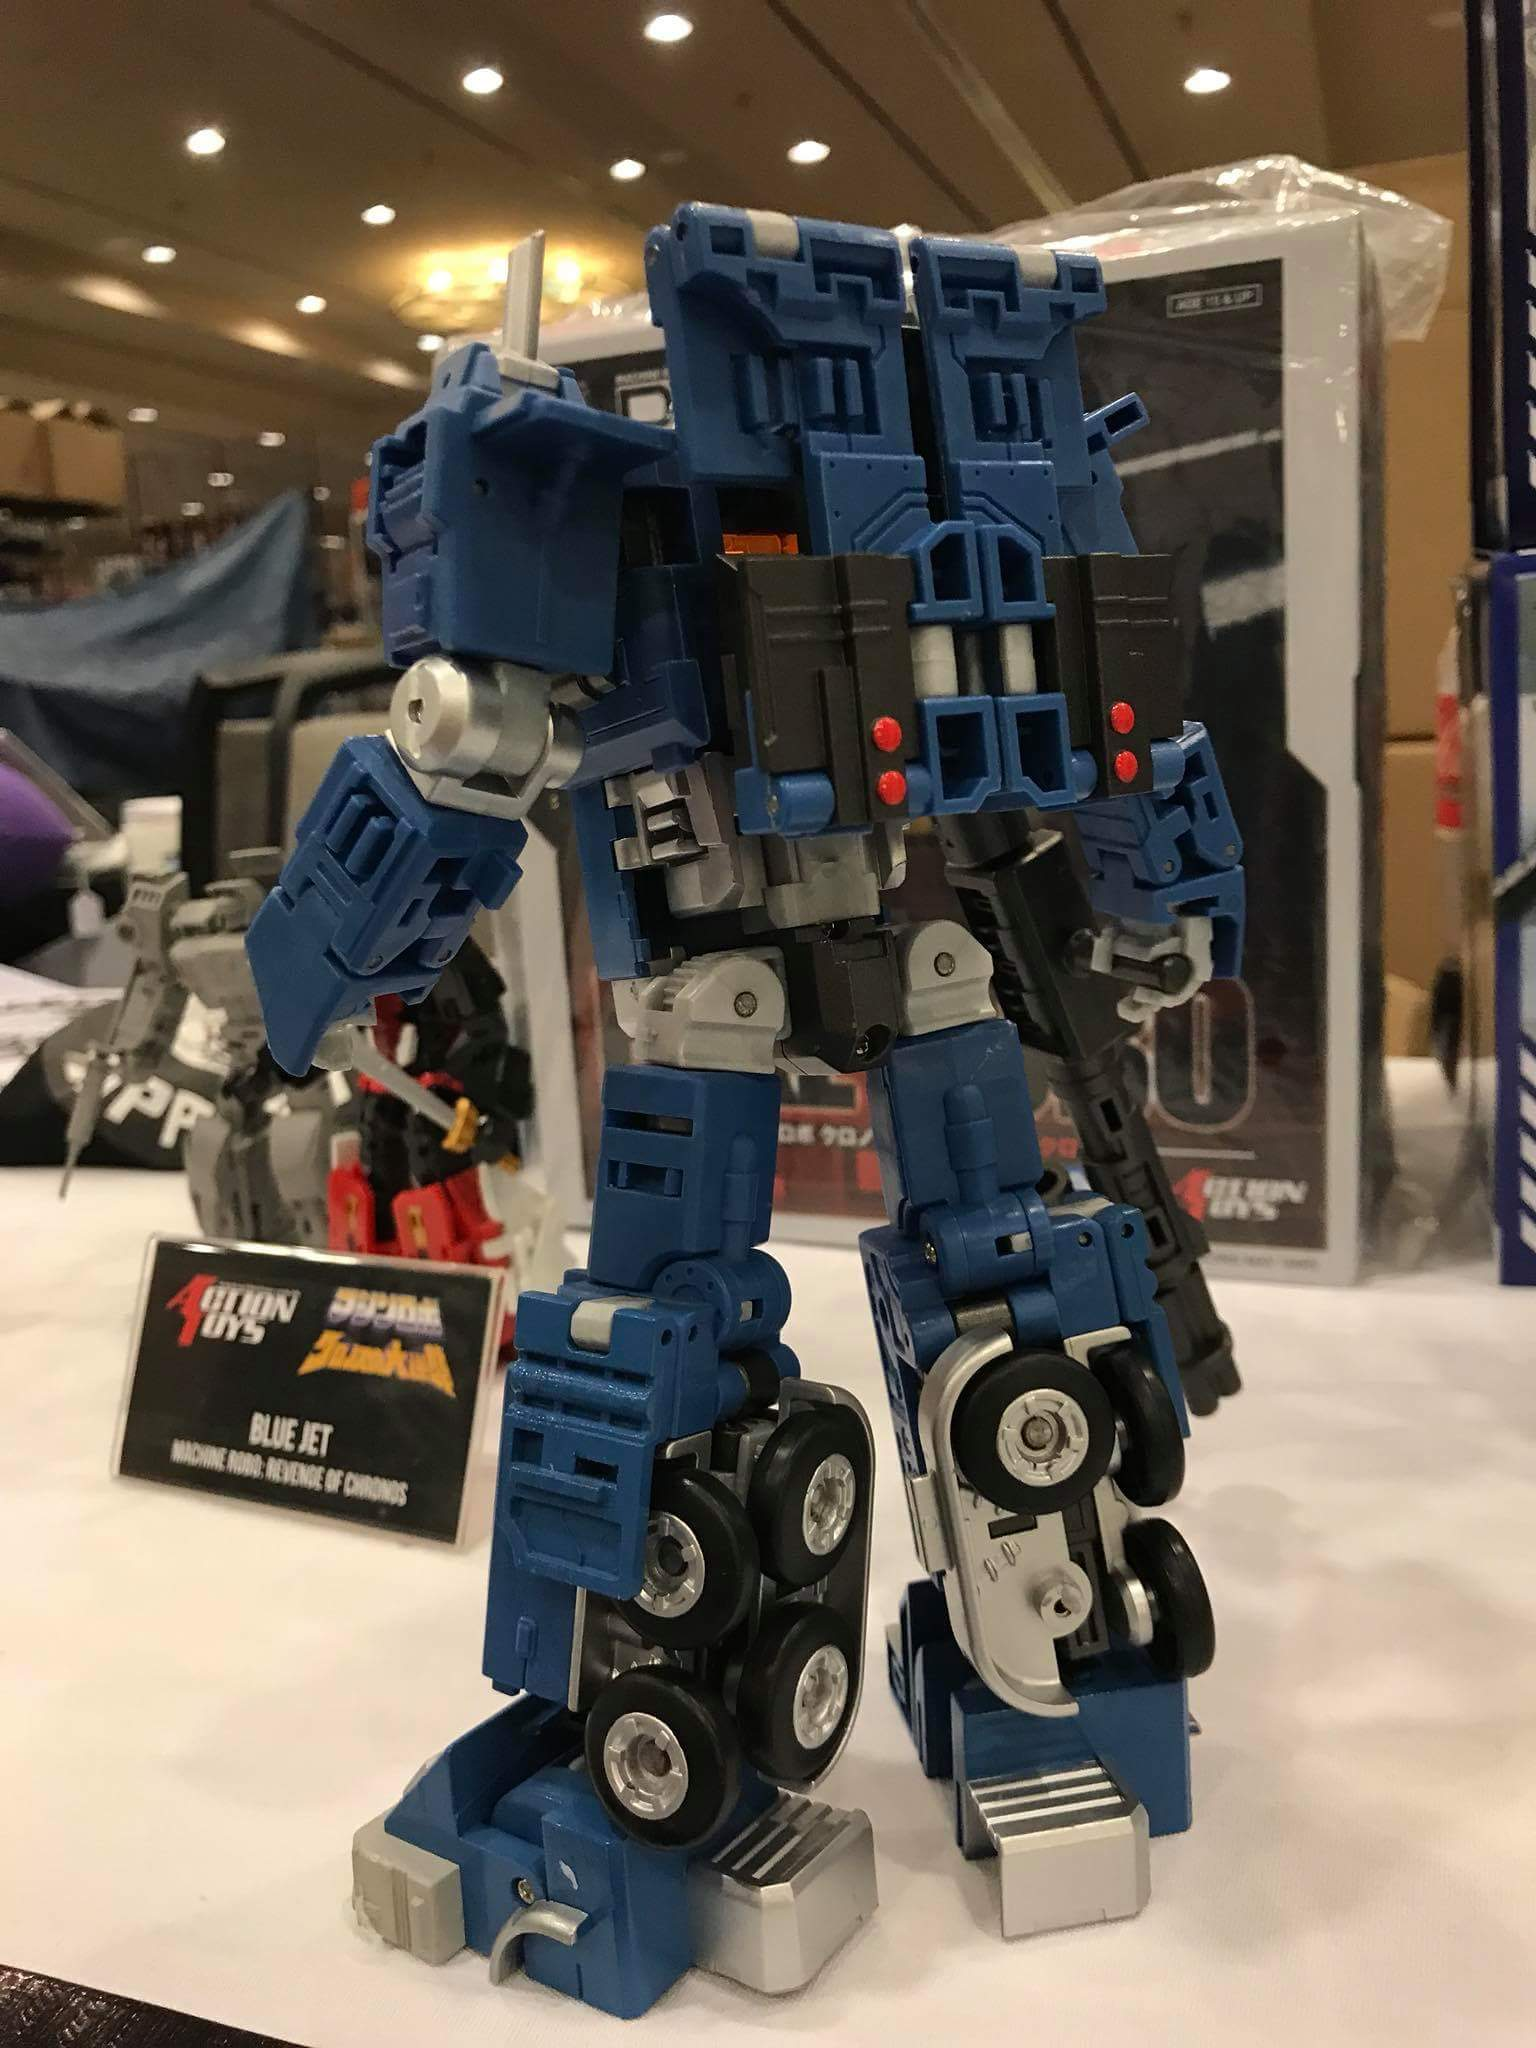 Gobots - Machine Robo ― Dessin Animé + Jouets  - Page 8 NZJvcpn5_o